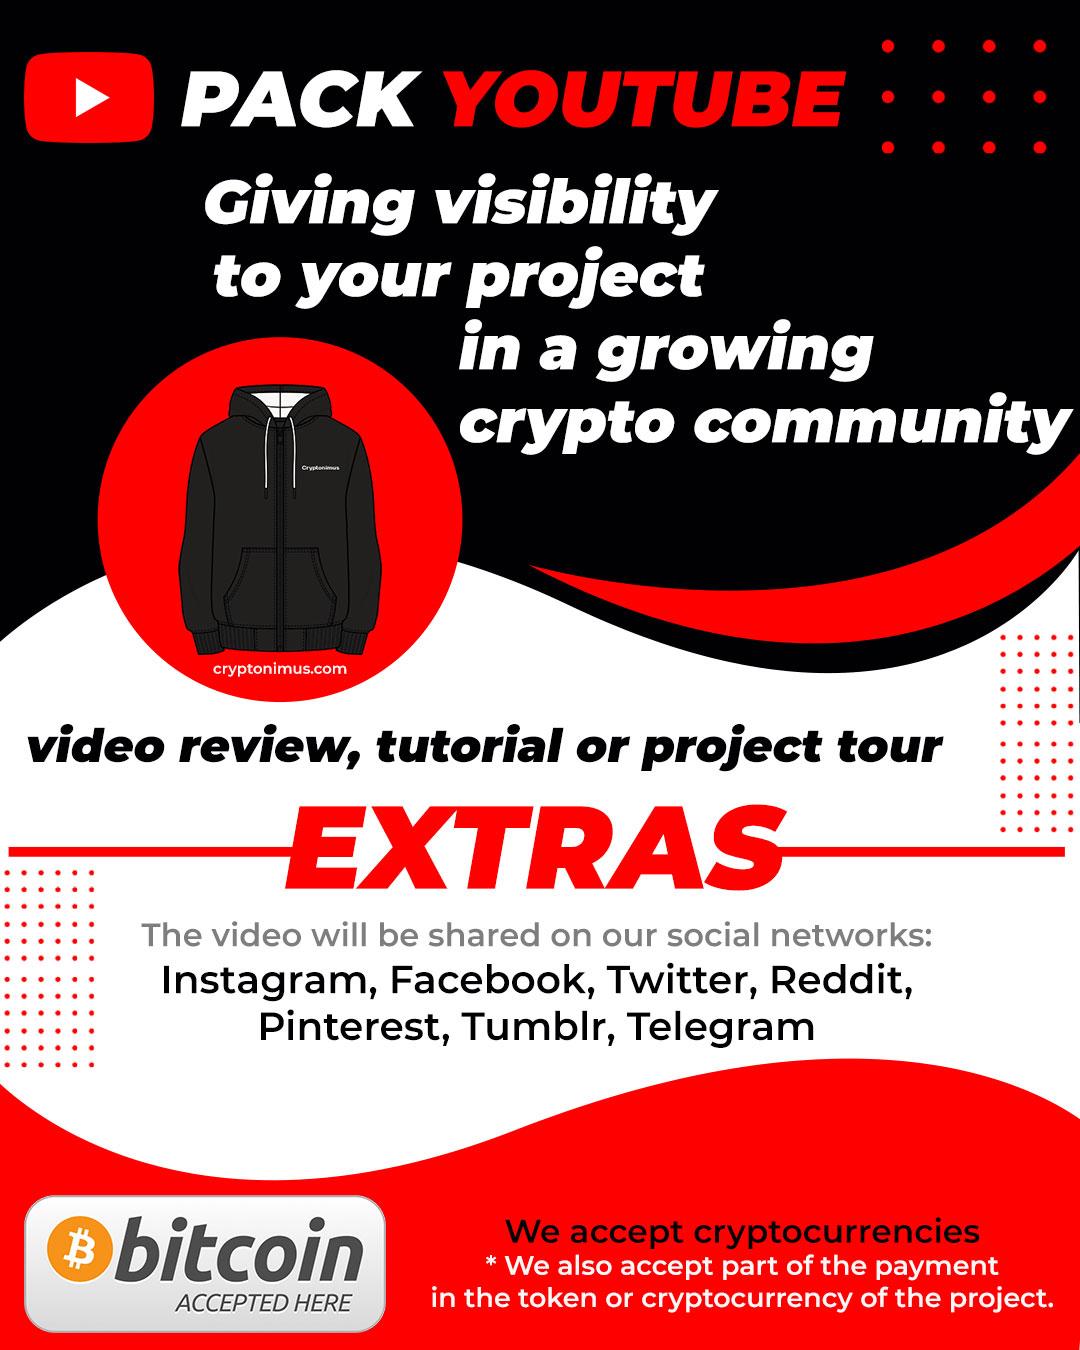 crypto token promo pack youtube cryptonimus advertising